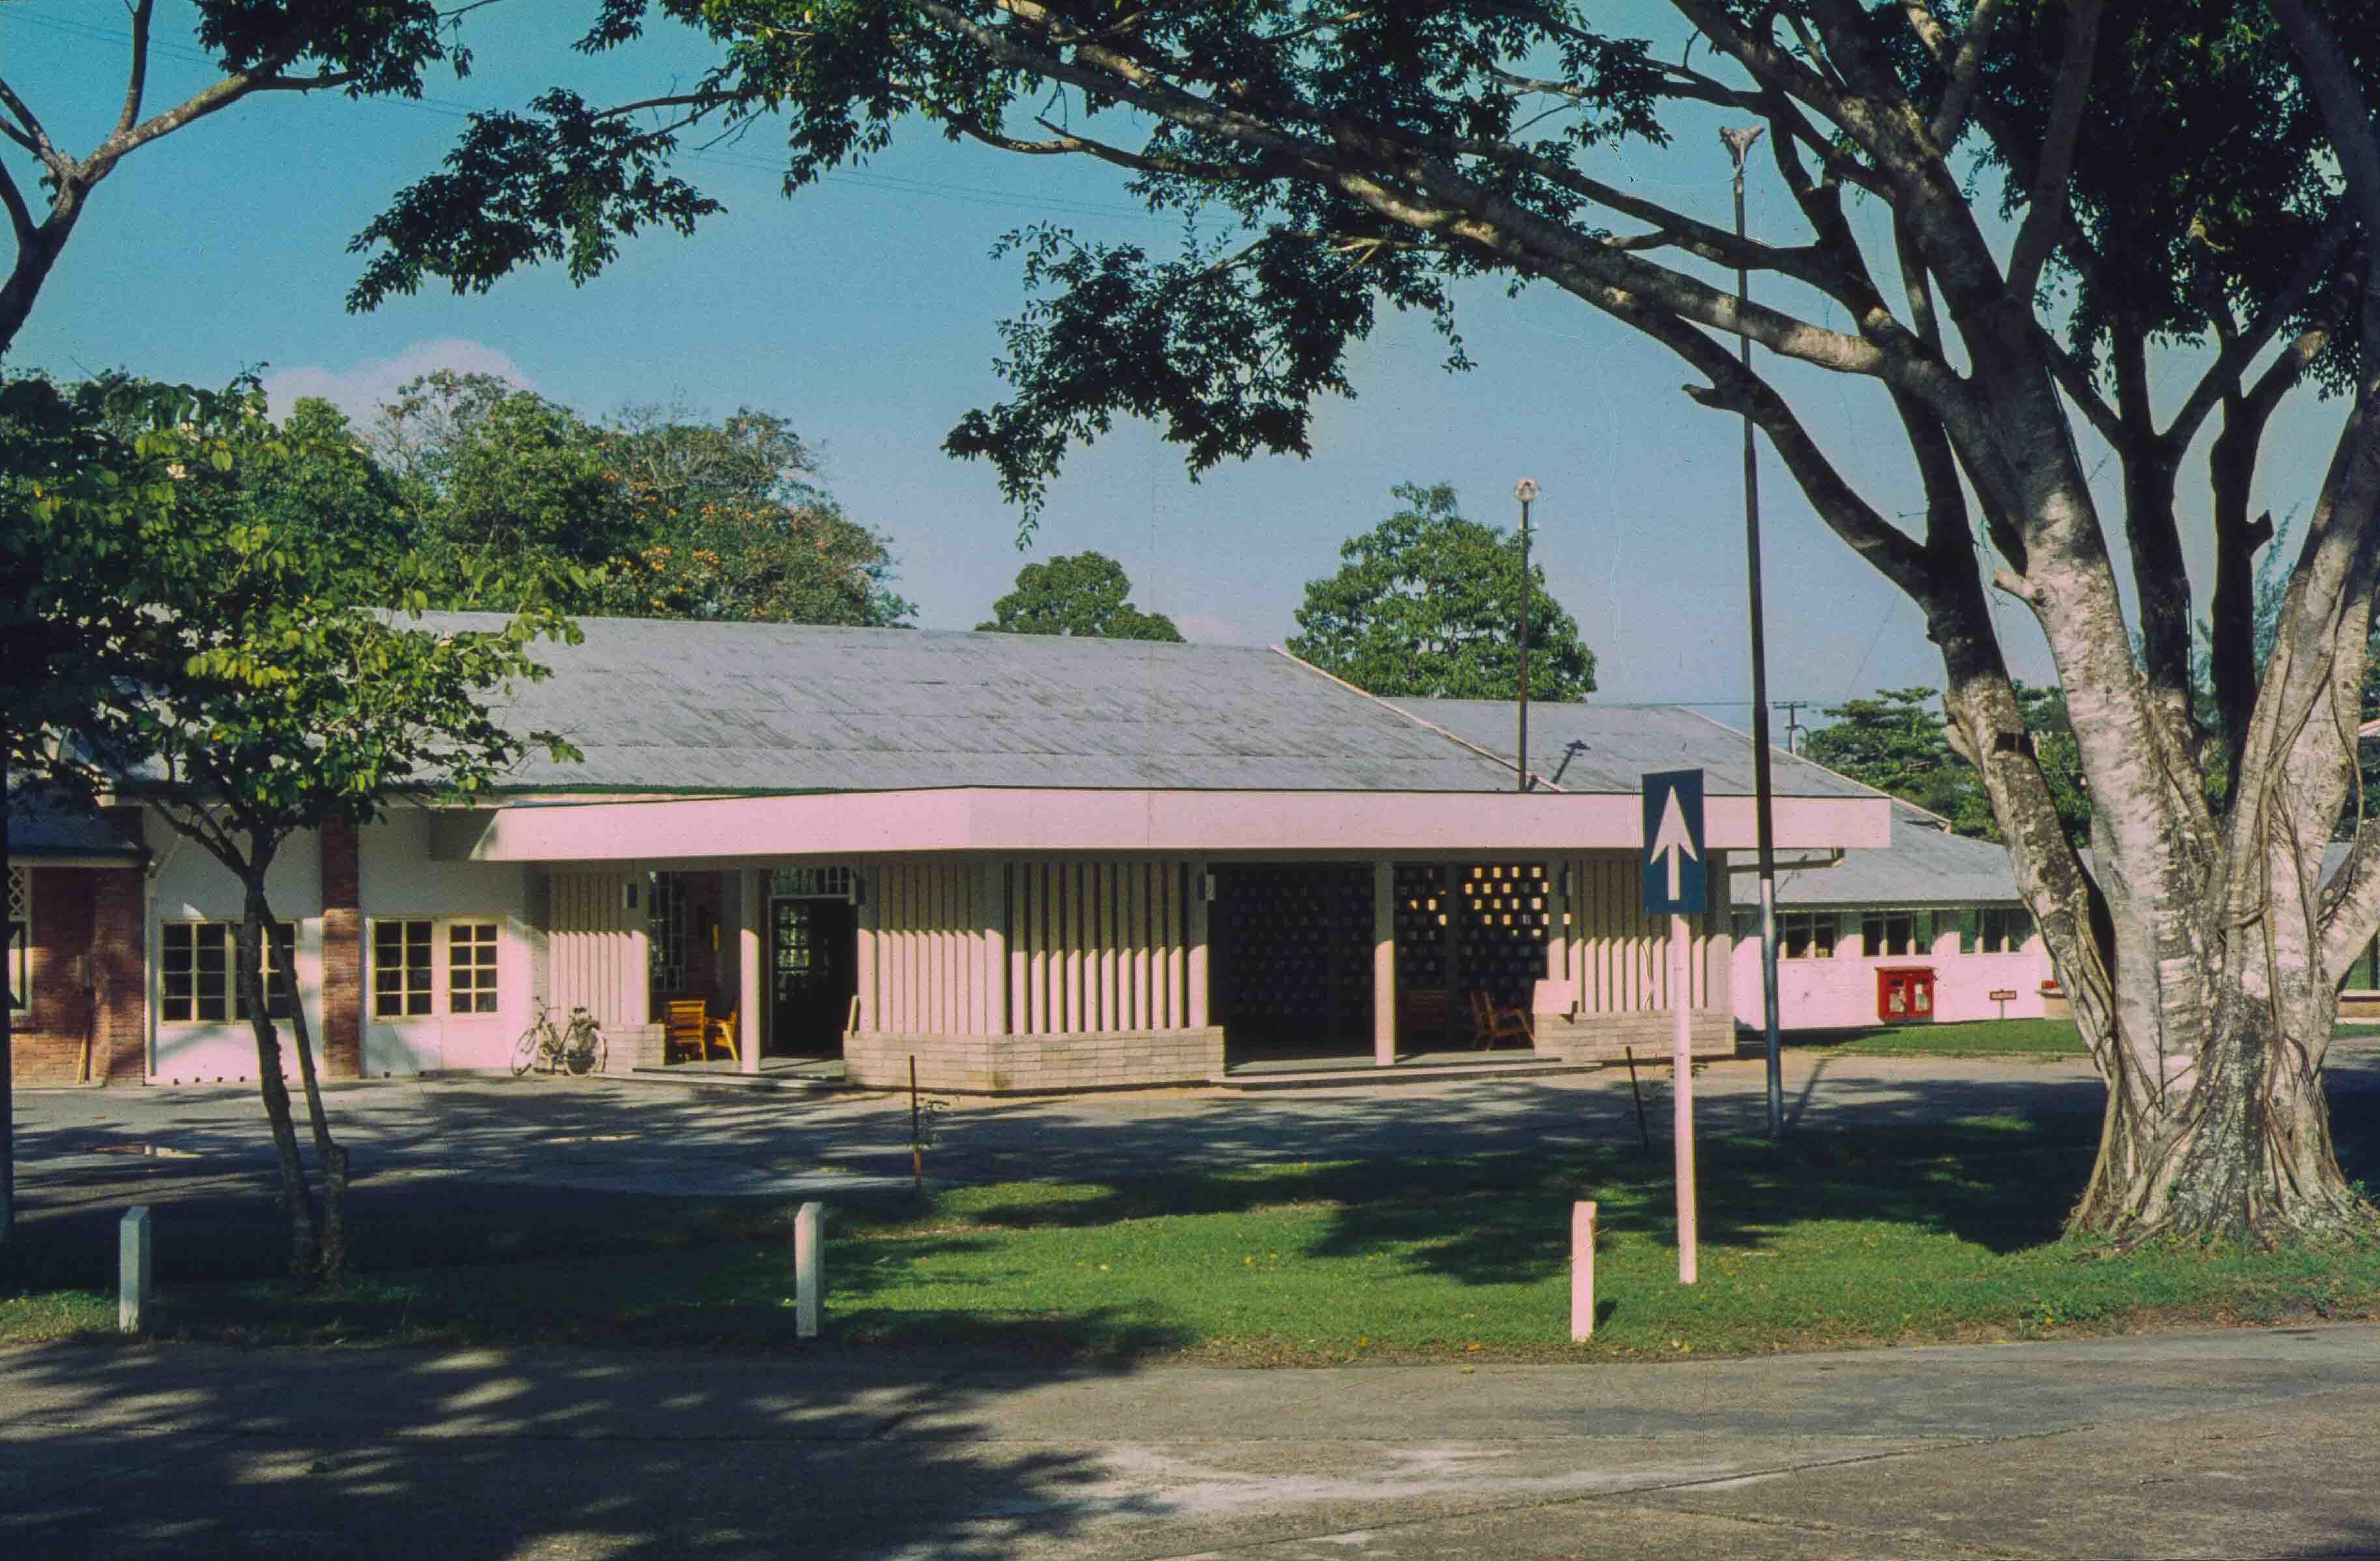 284. Suriname